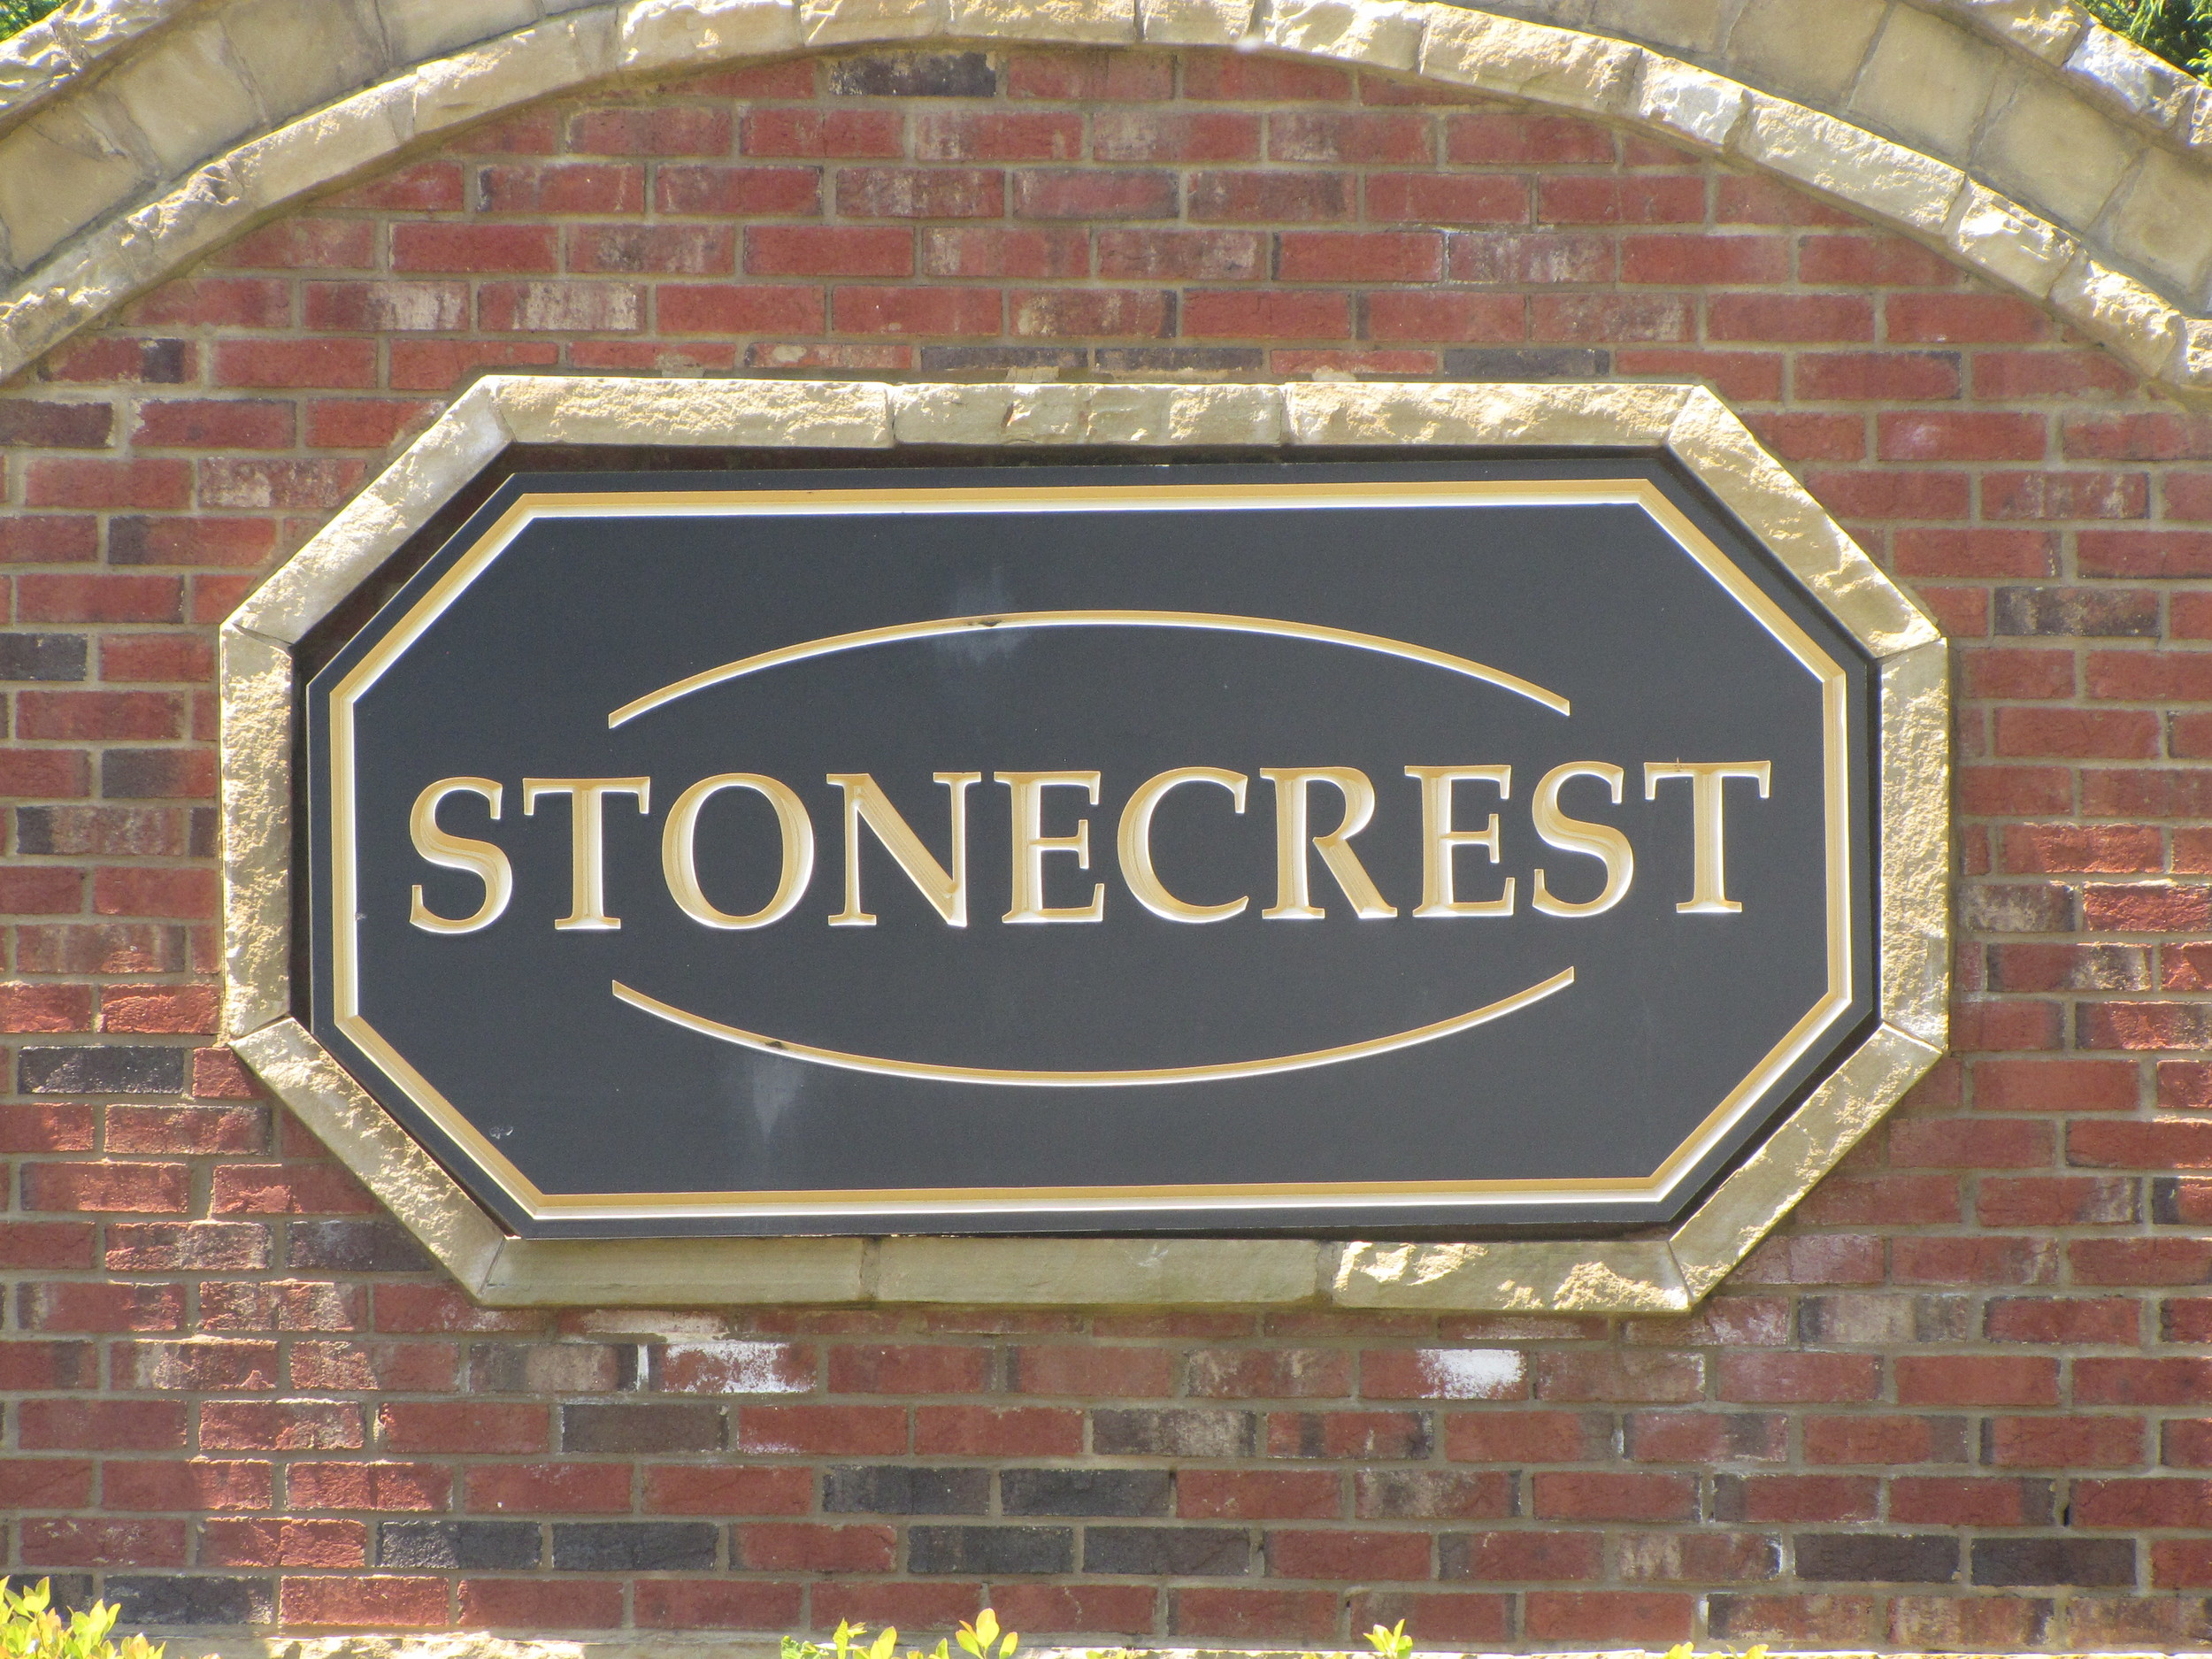 Stonecrest Neighborhood Monument